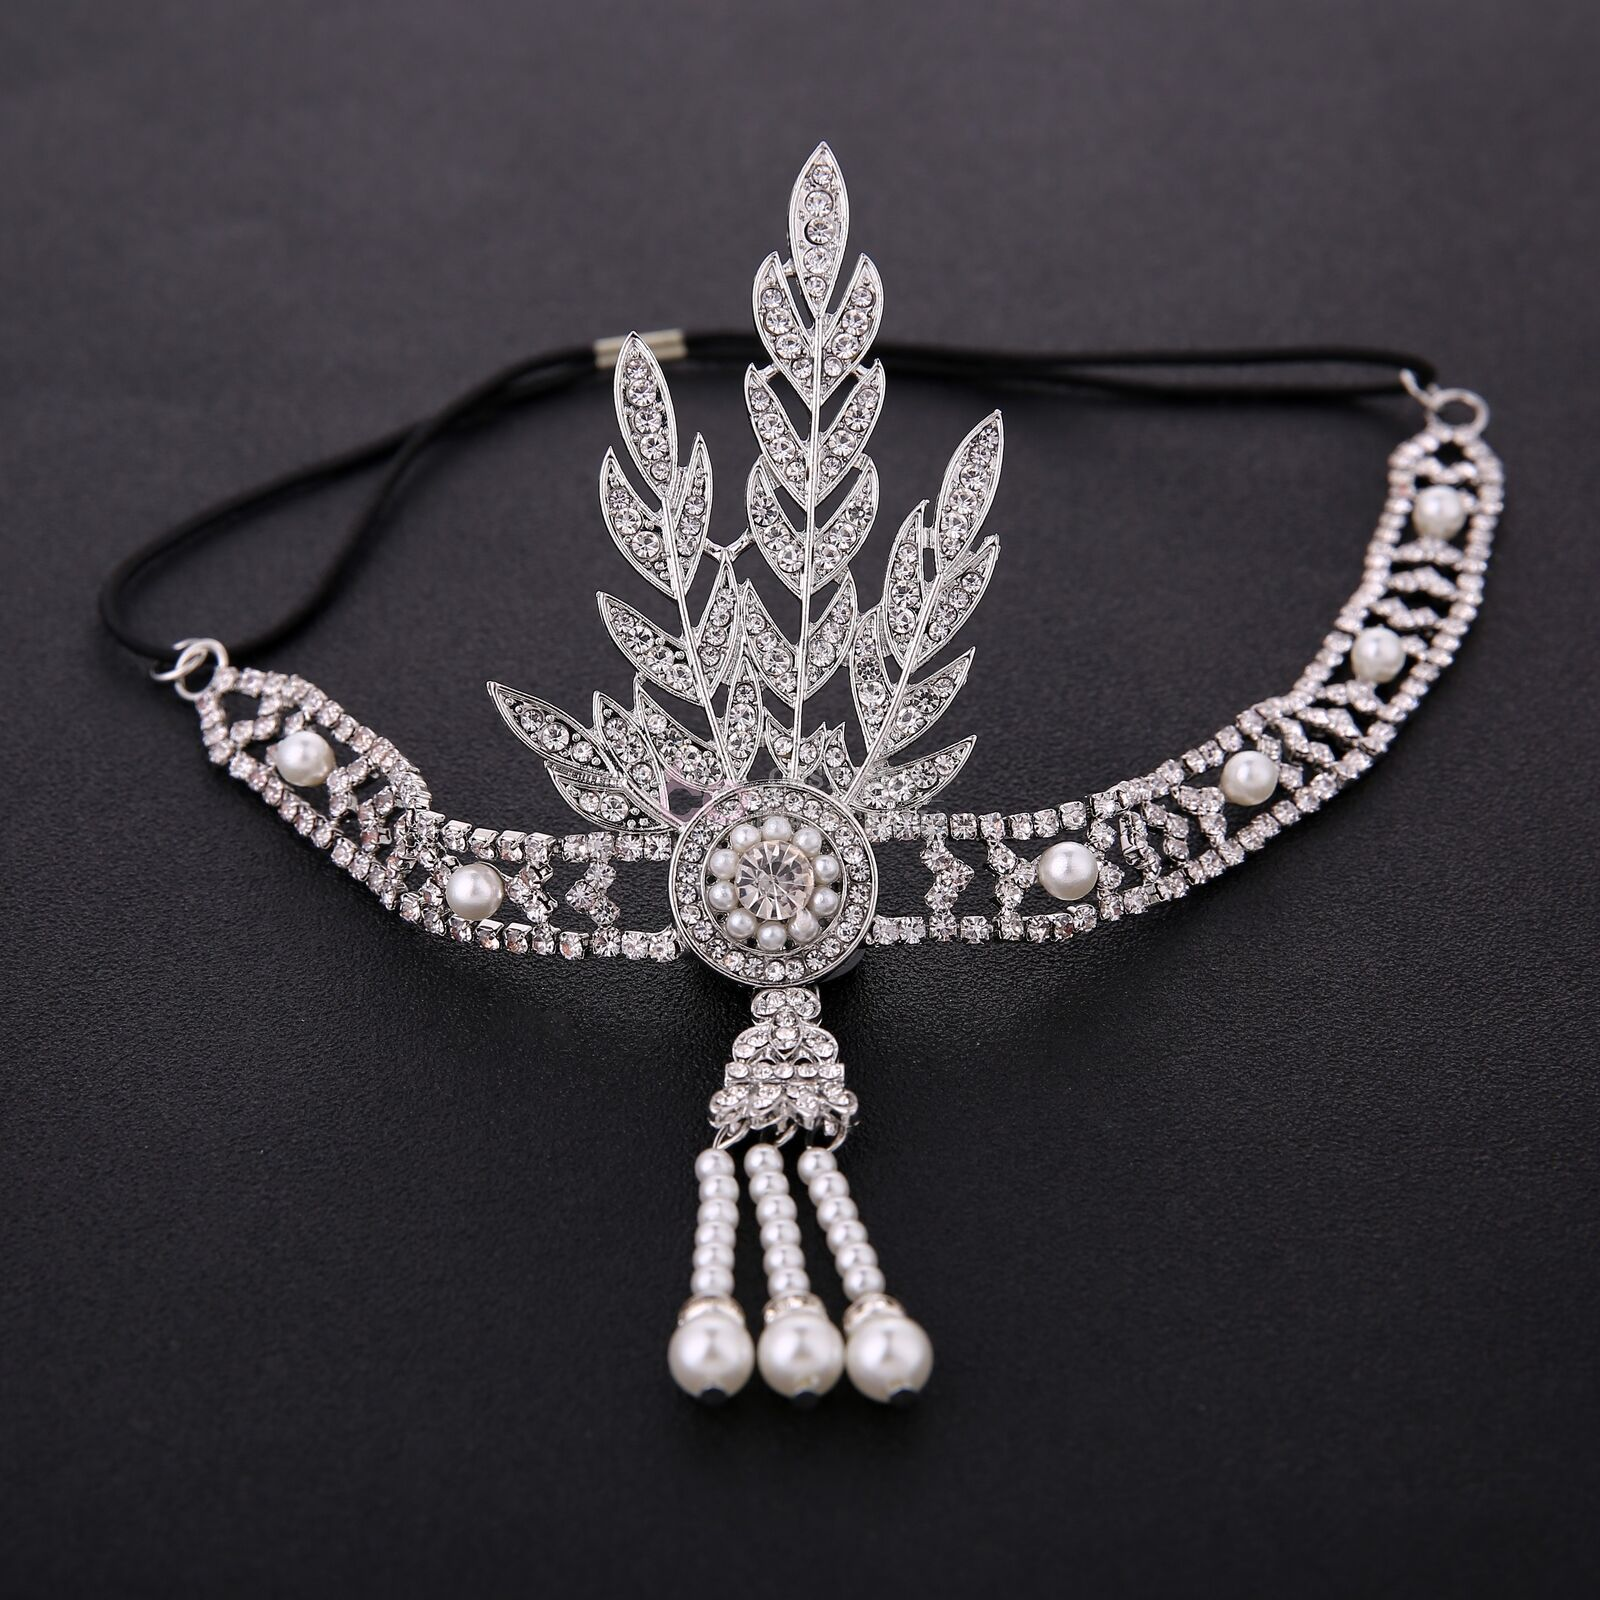 1920s 20s Gatsby Headband Vintage Bridal Headpiece Silver Gold Costume Accessory